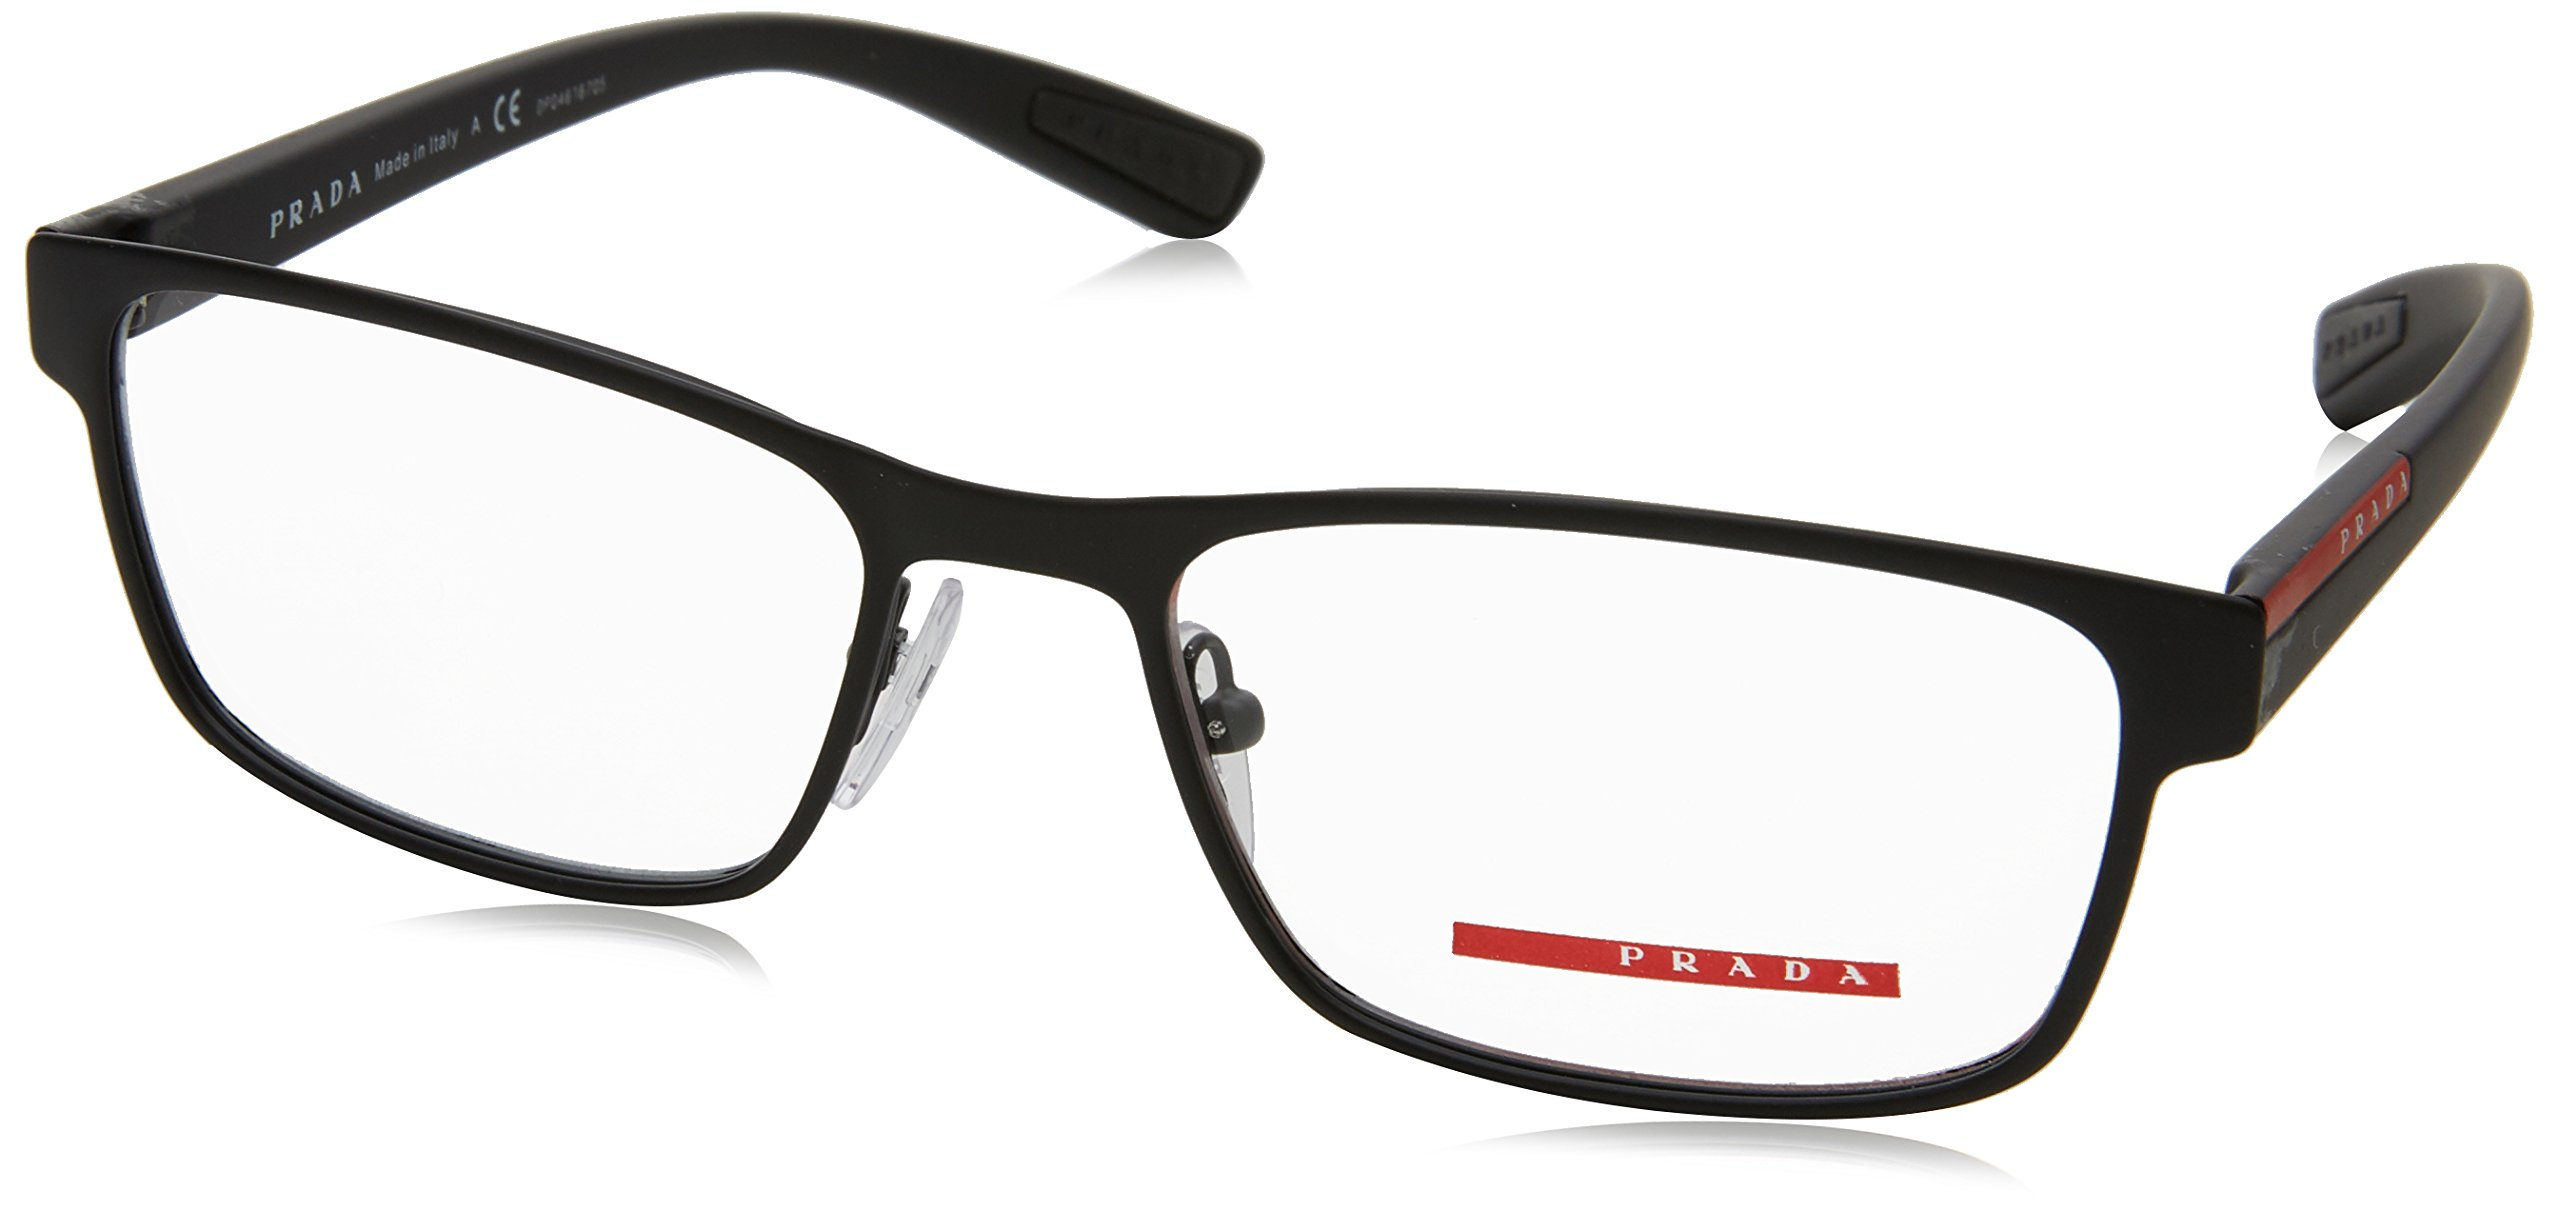 Prada PS50GV Eyeglass Frames DG01O1-53 - Black Rubber PS50GV-DG01O1-53